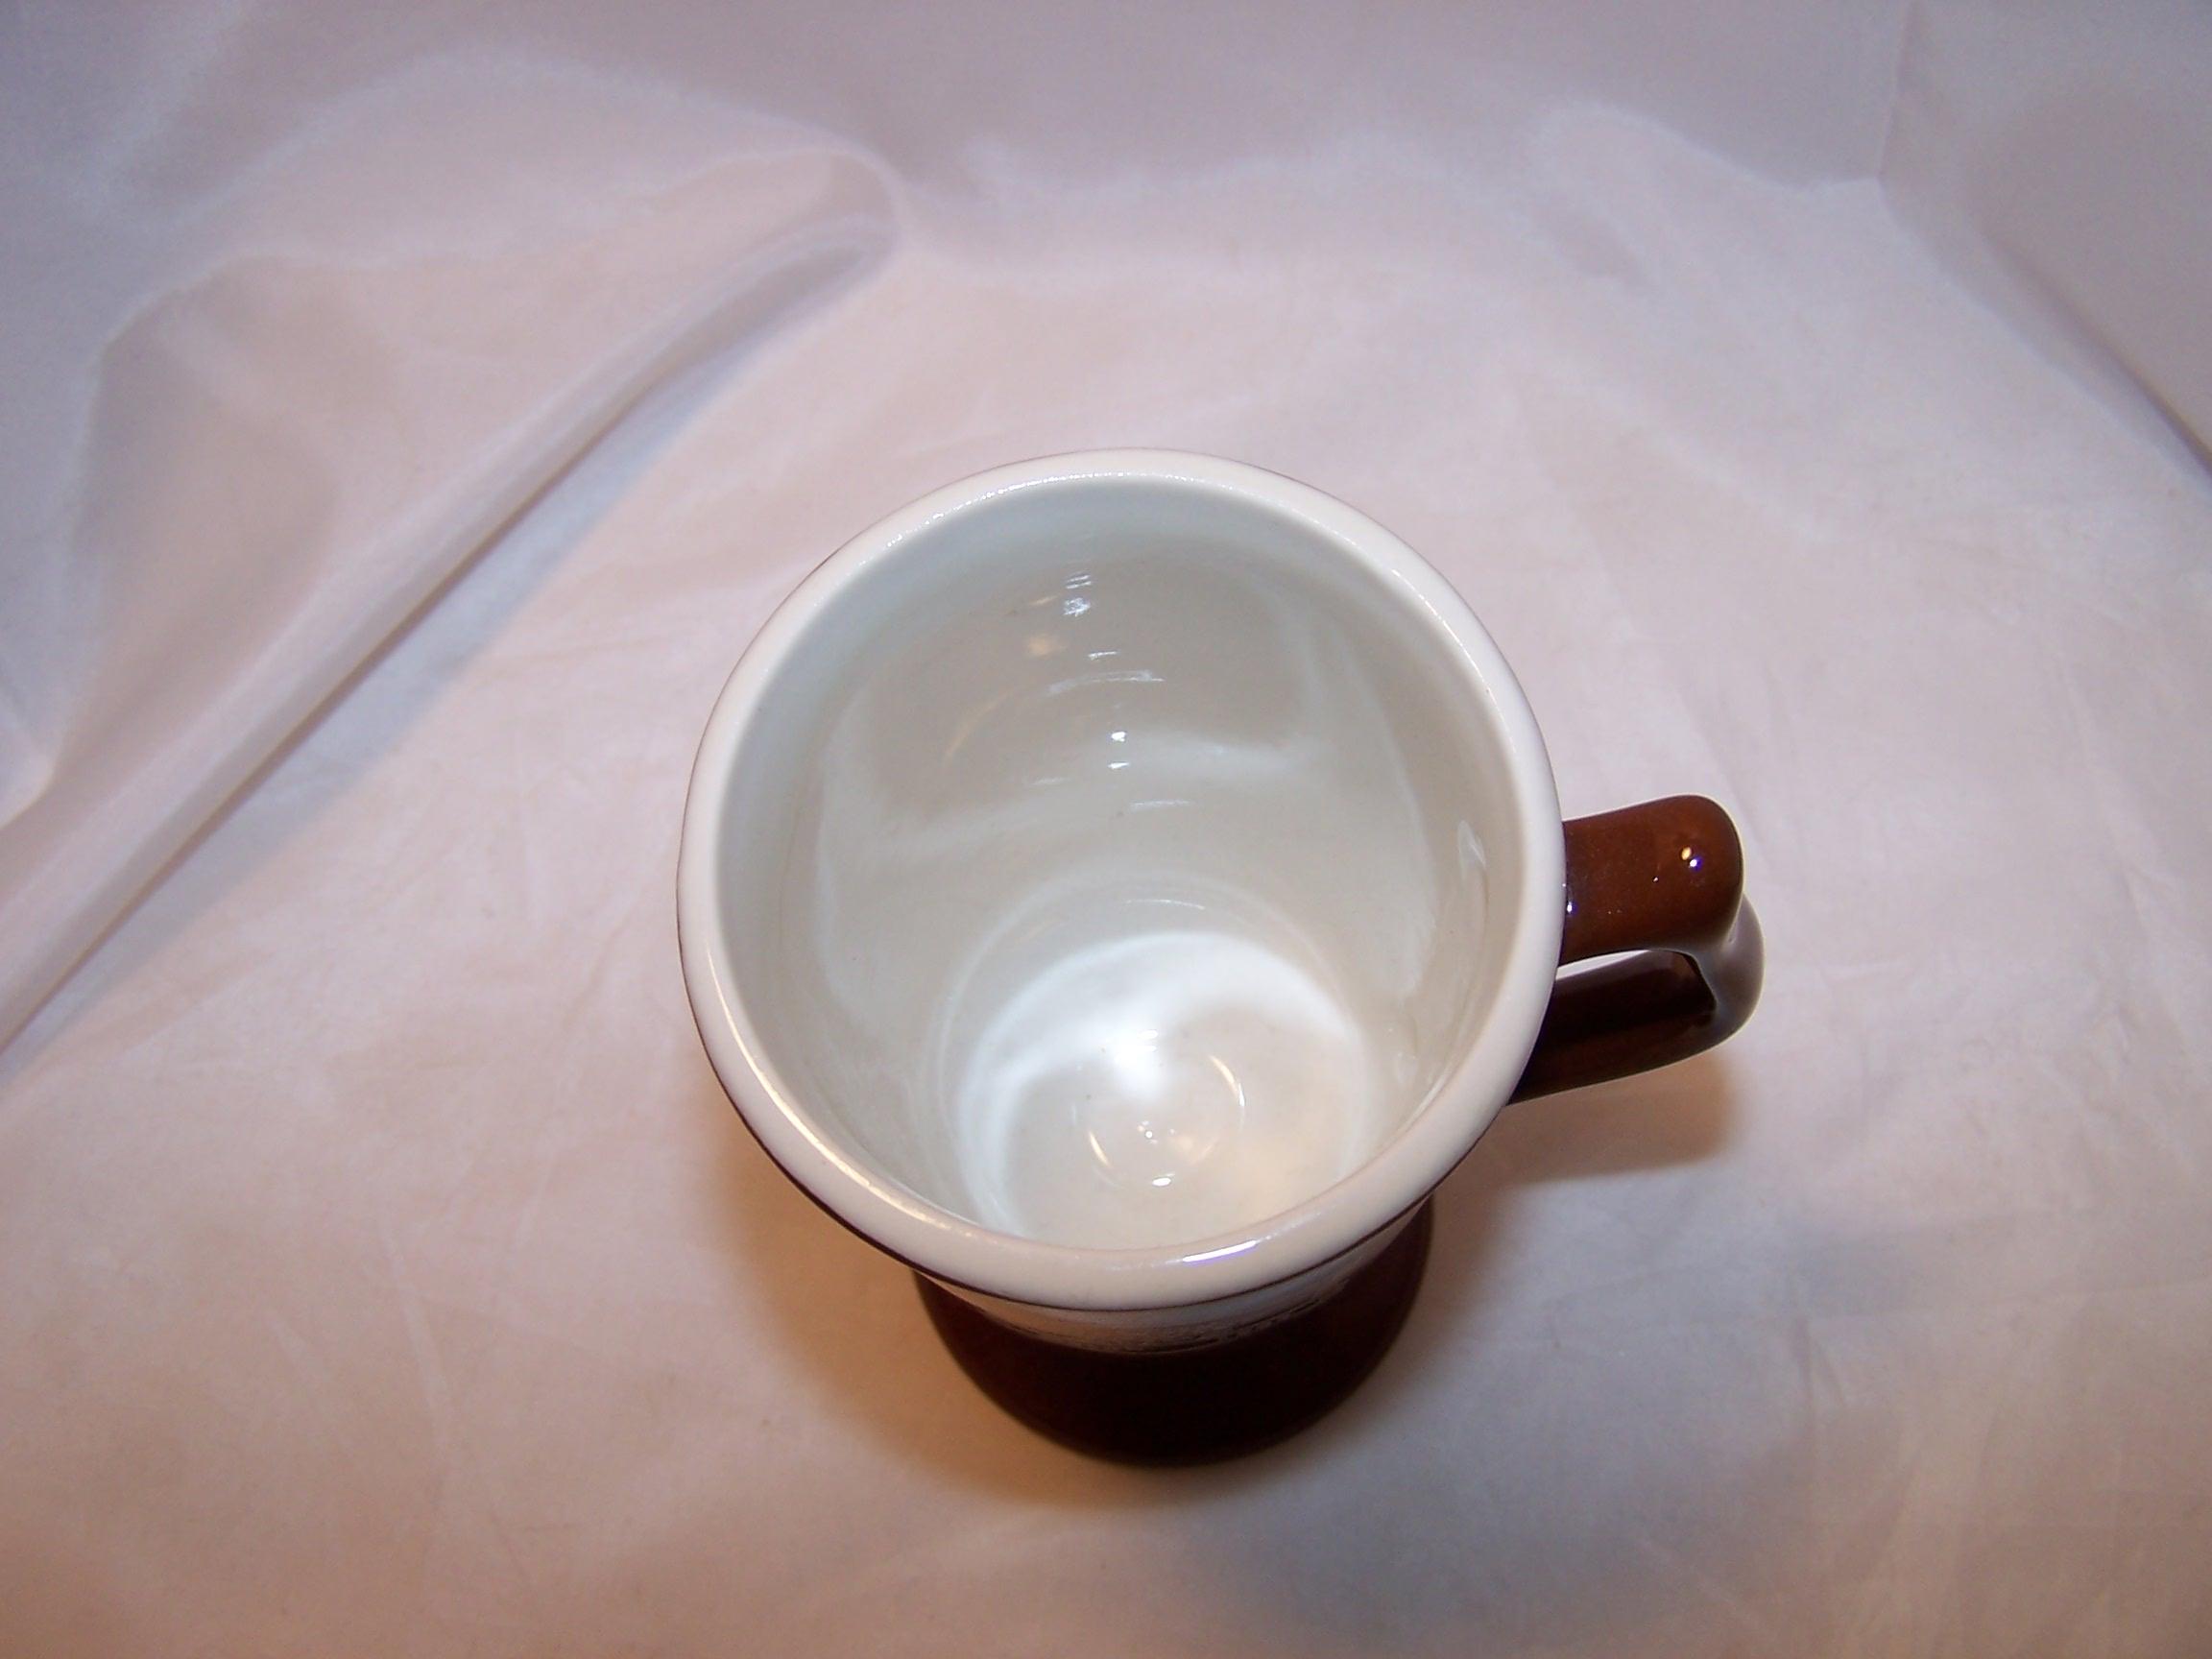 Image 4 of George Steinbrenner Mug, The Pewter Mug Restaurant